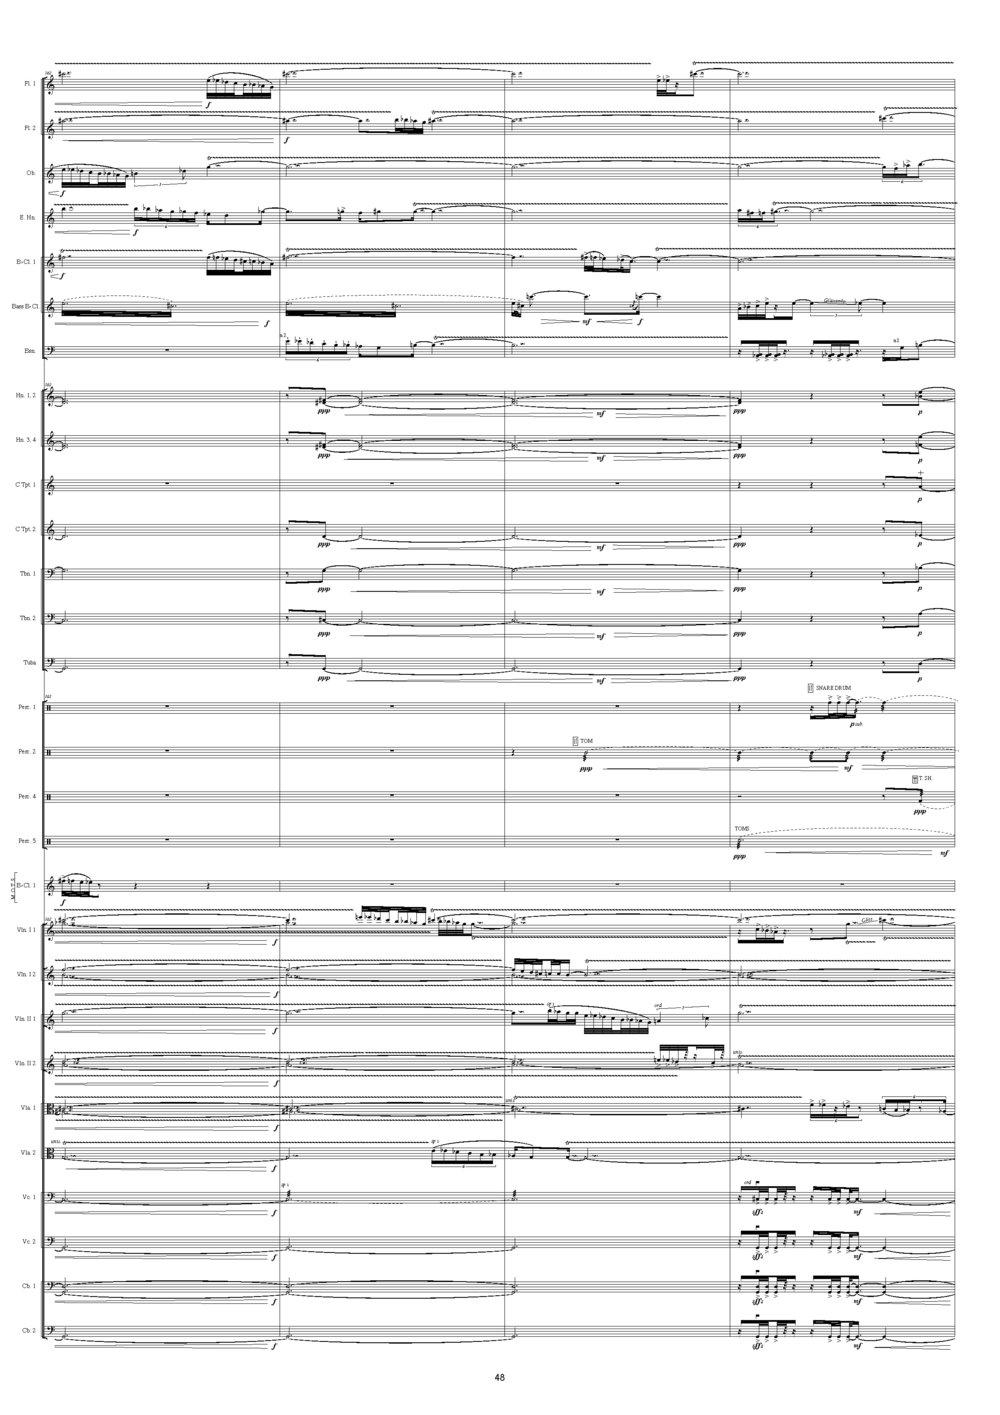 METANOIA_2009-RAPPOPORT_Seite_48.jpg